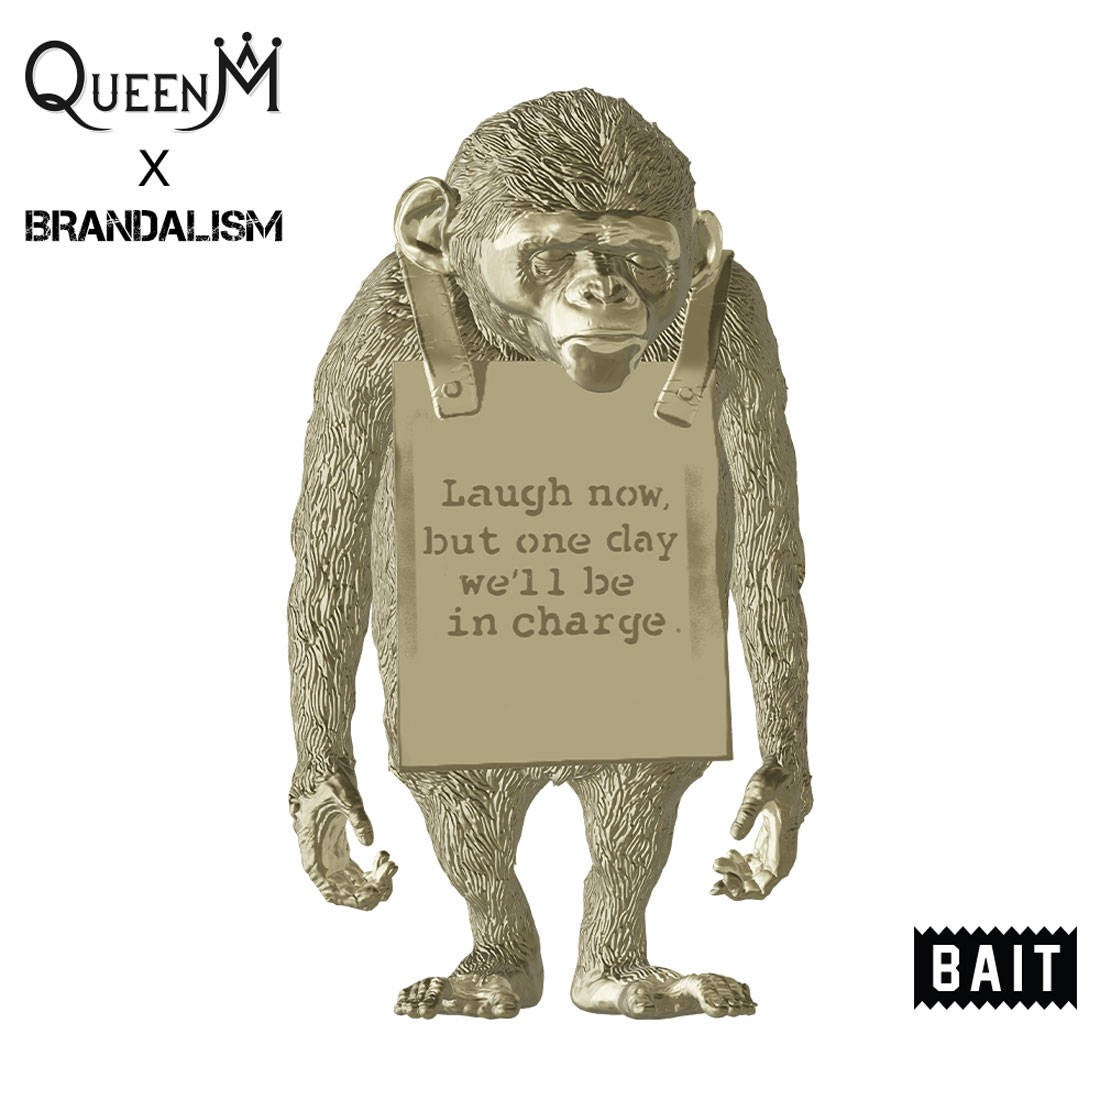 PREORDER - BAIT x Queen M x Brandalism Laugh Now Monkey 8 Inch Figure - SDCC 2021 Exclusive (gold)